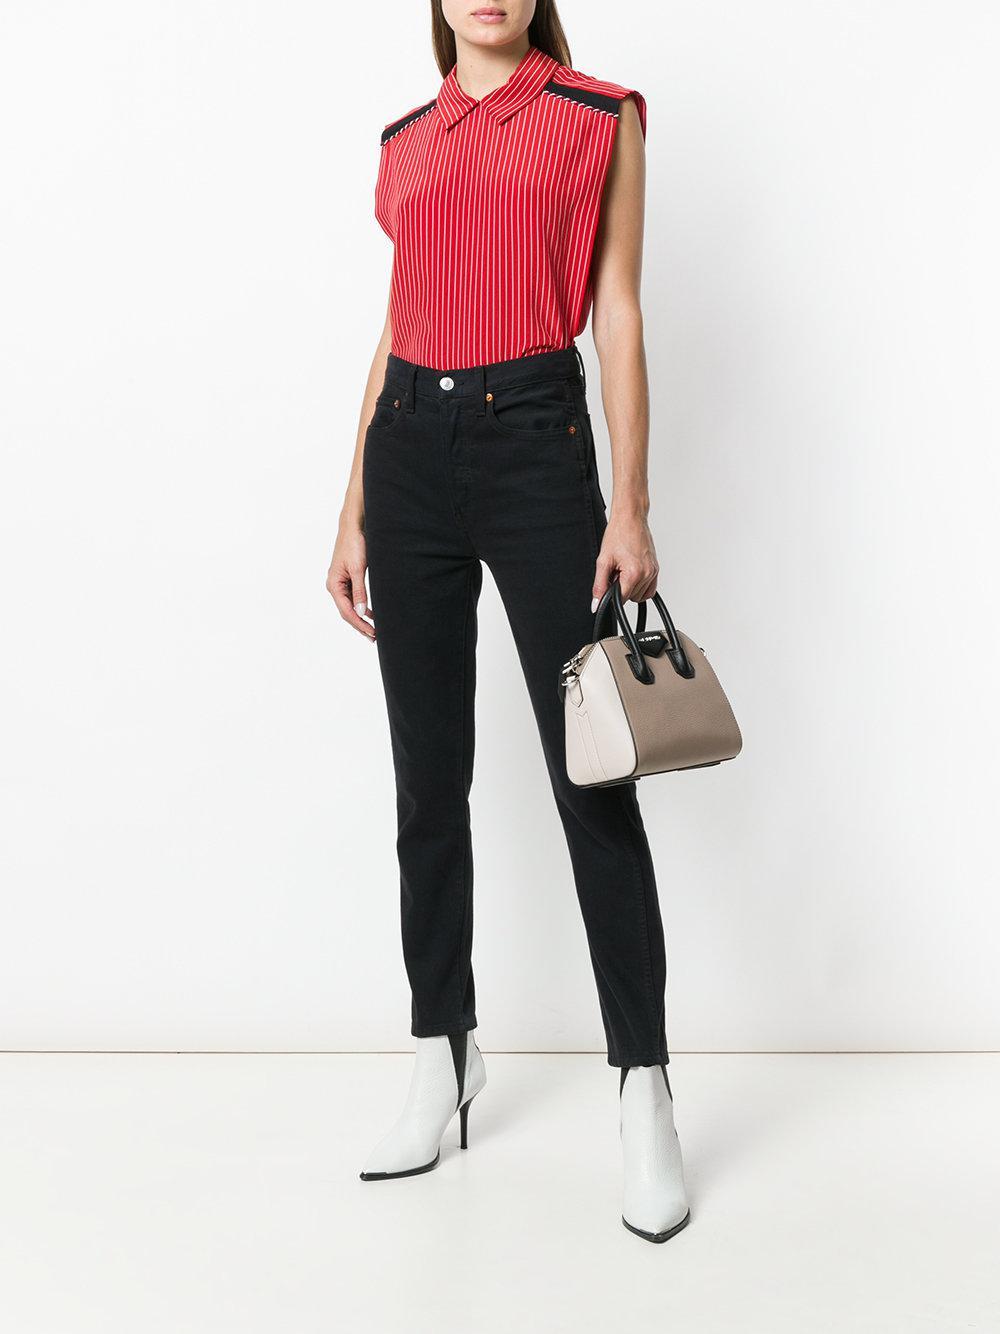 Givenchy Leather Antigona Tote